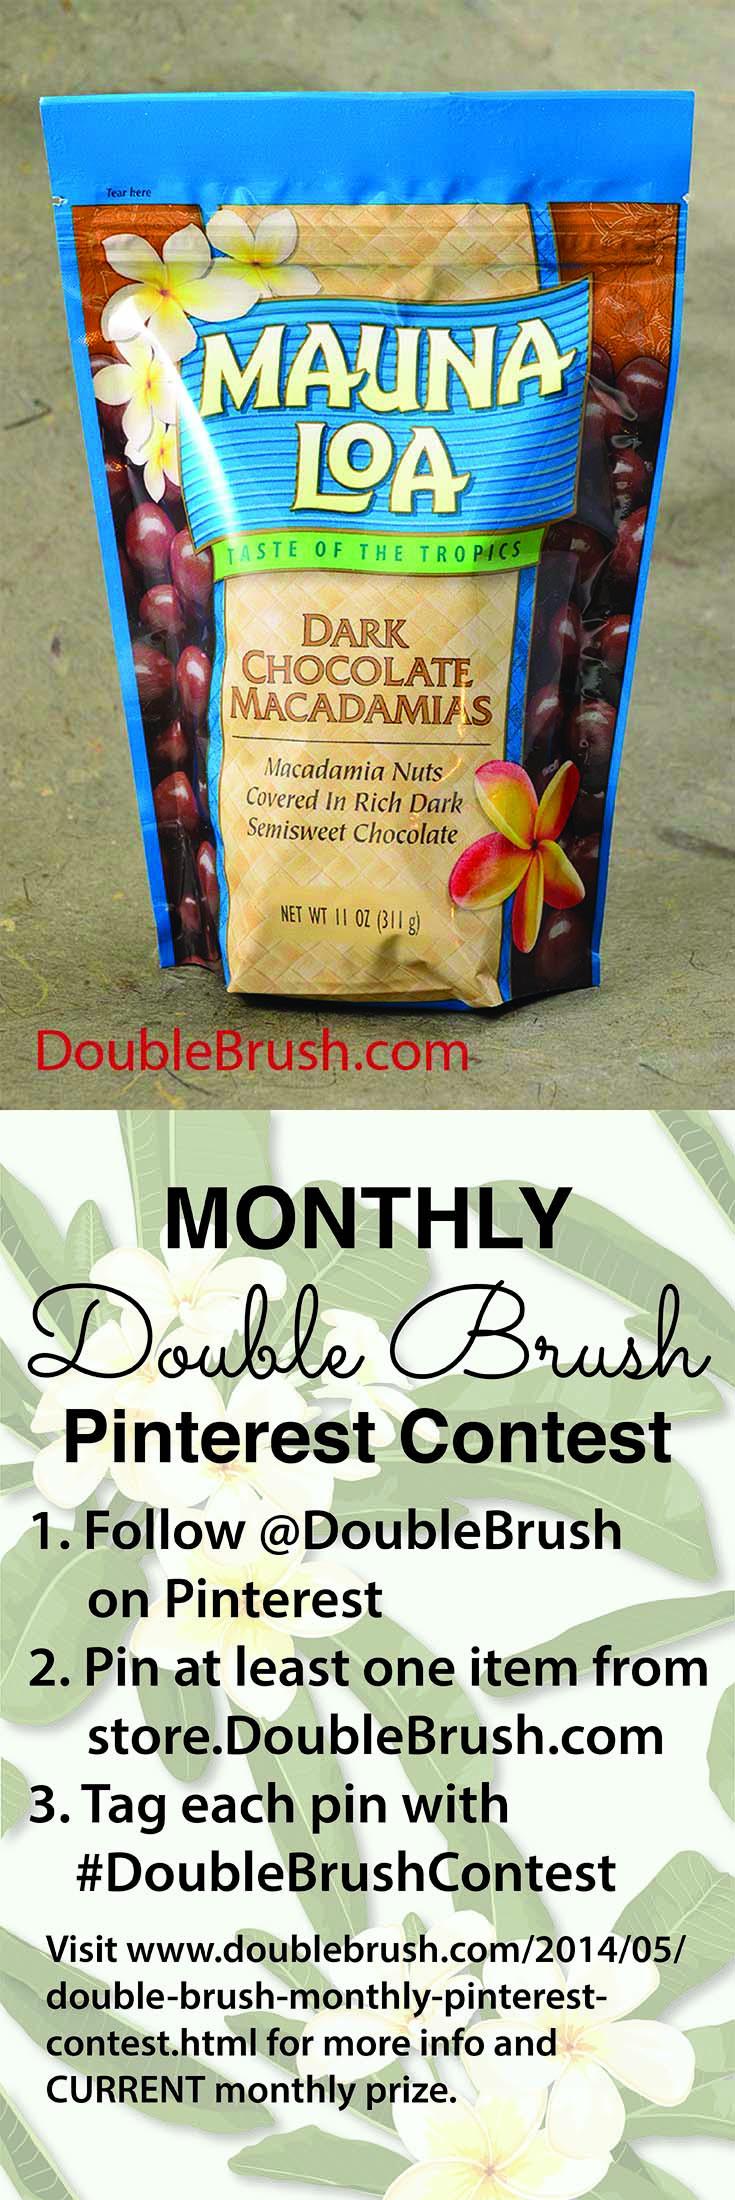 Pinterest contest July 2014-mauna loa chocloate nuts